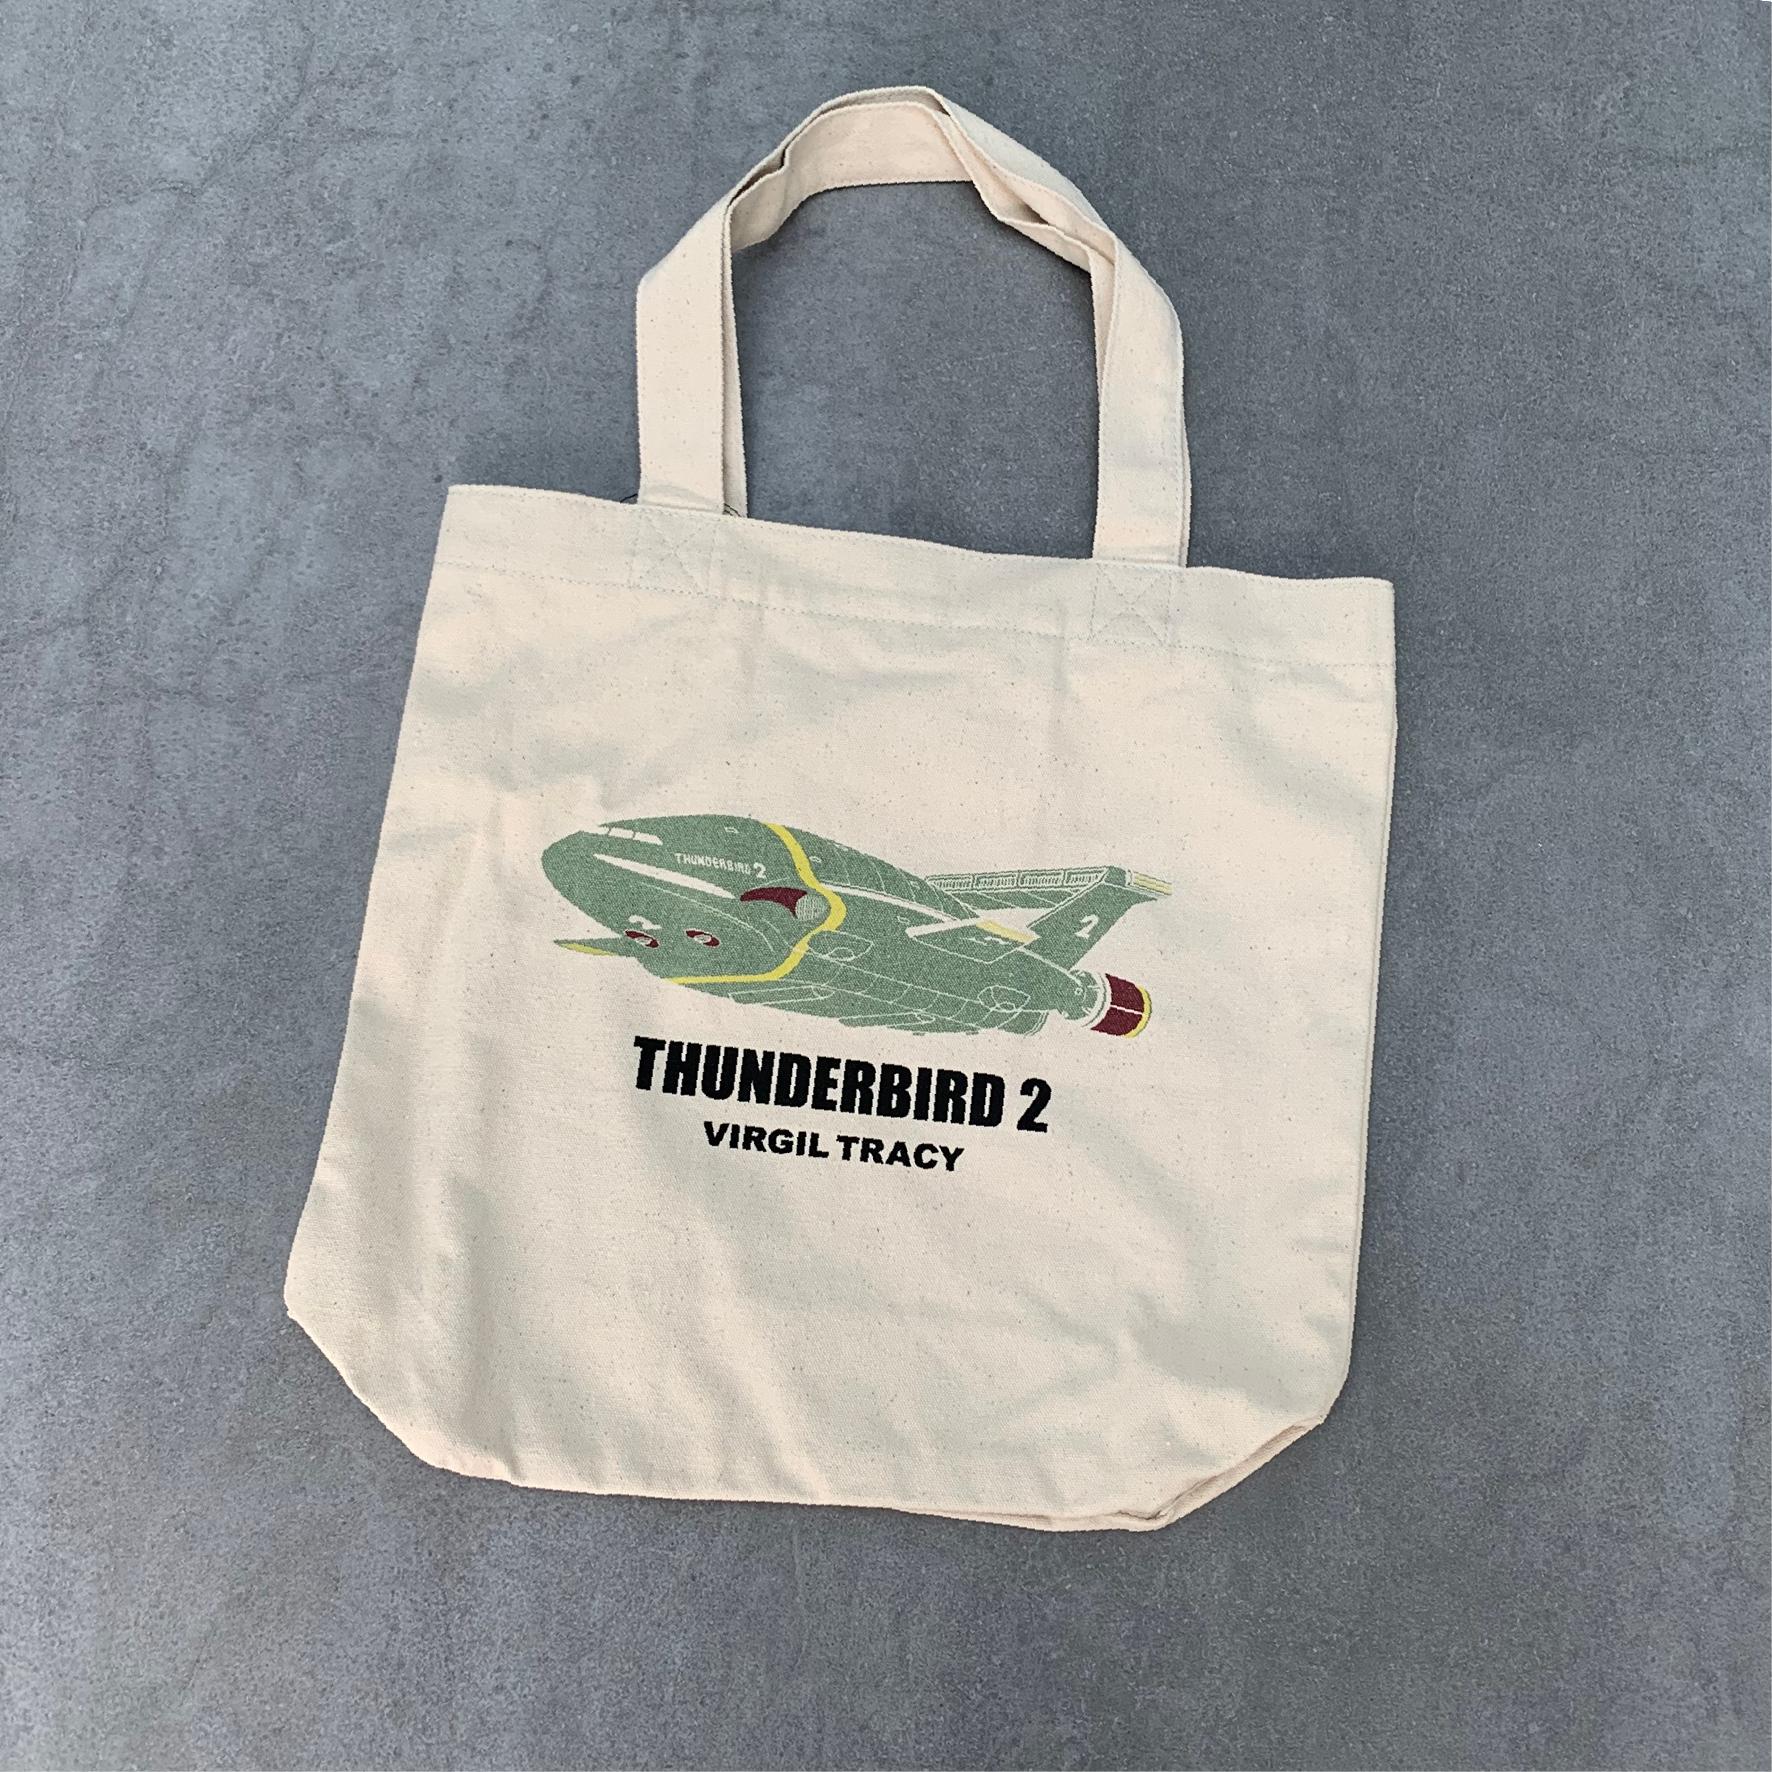 Supercelebration Treasure 4: Cushion covers, bag, blueprint and more